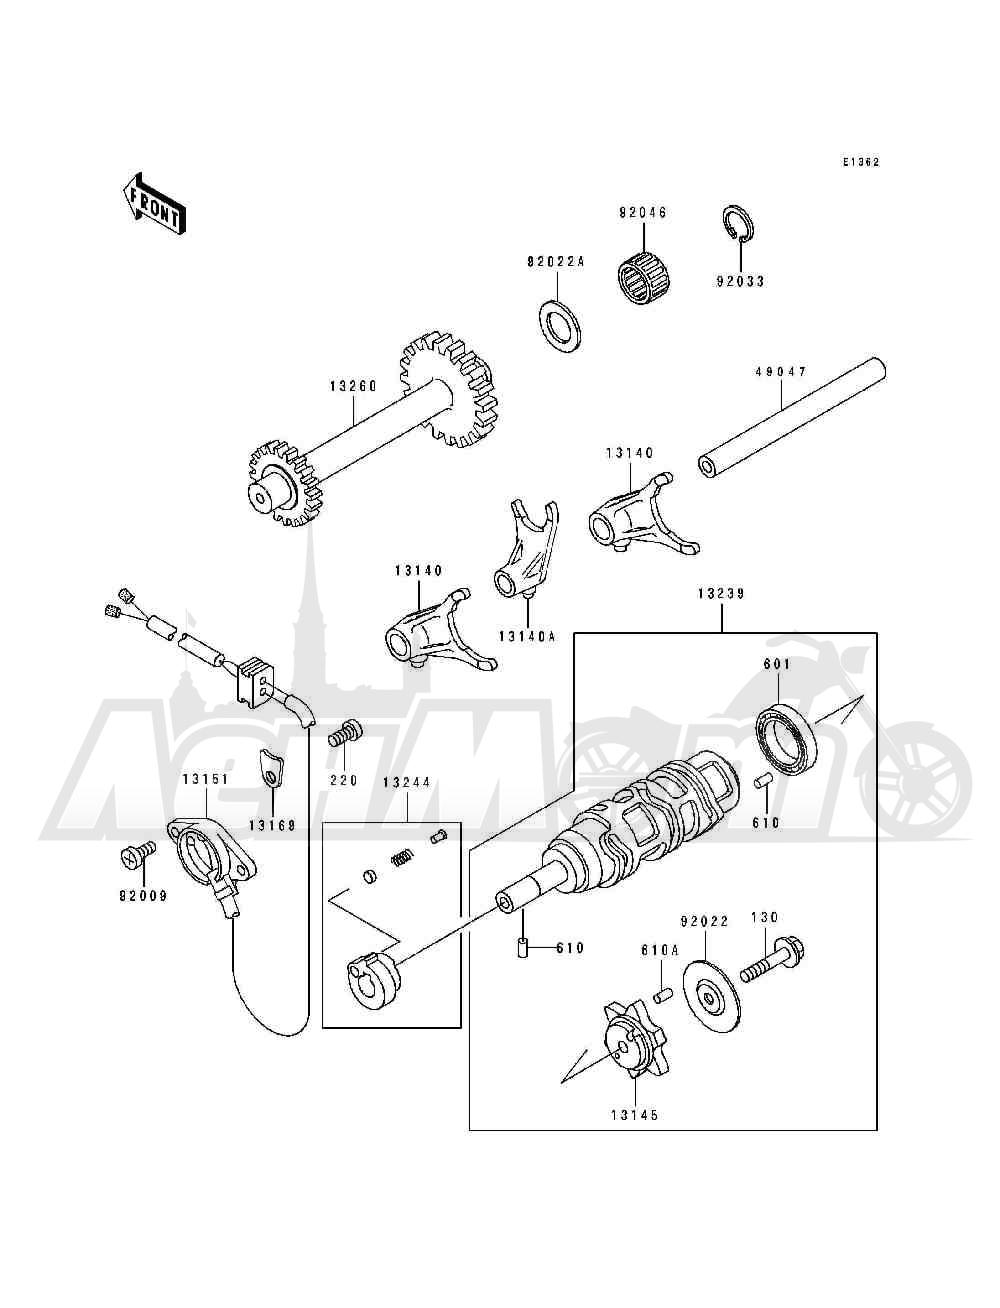 Запчасти для Квадроцикла Kawasaki 1994 BAYOU 400 4X4 (KLF400-B2) Раздел: GEAR CHANGE DRUM / SHIFT FORK(S) | переключение передач барабан/вилка переключения (S)